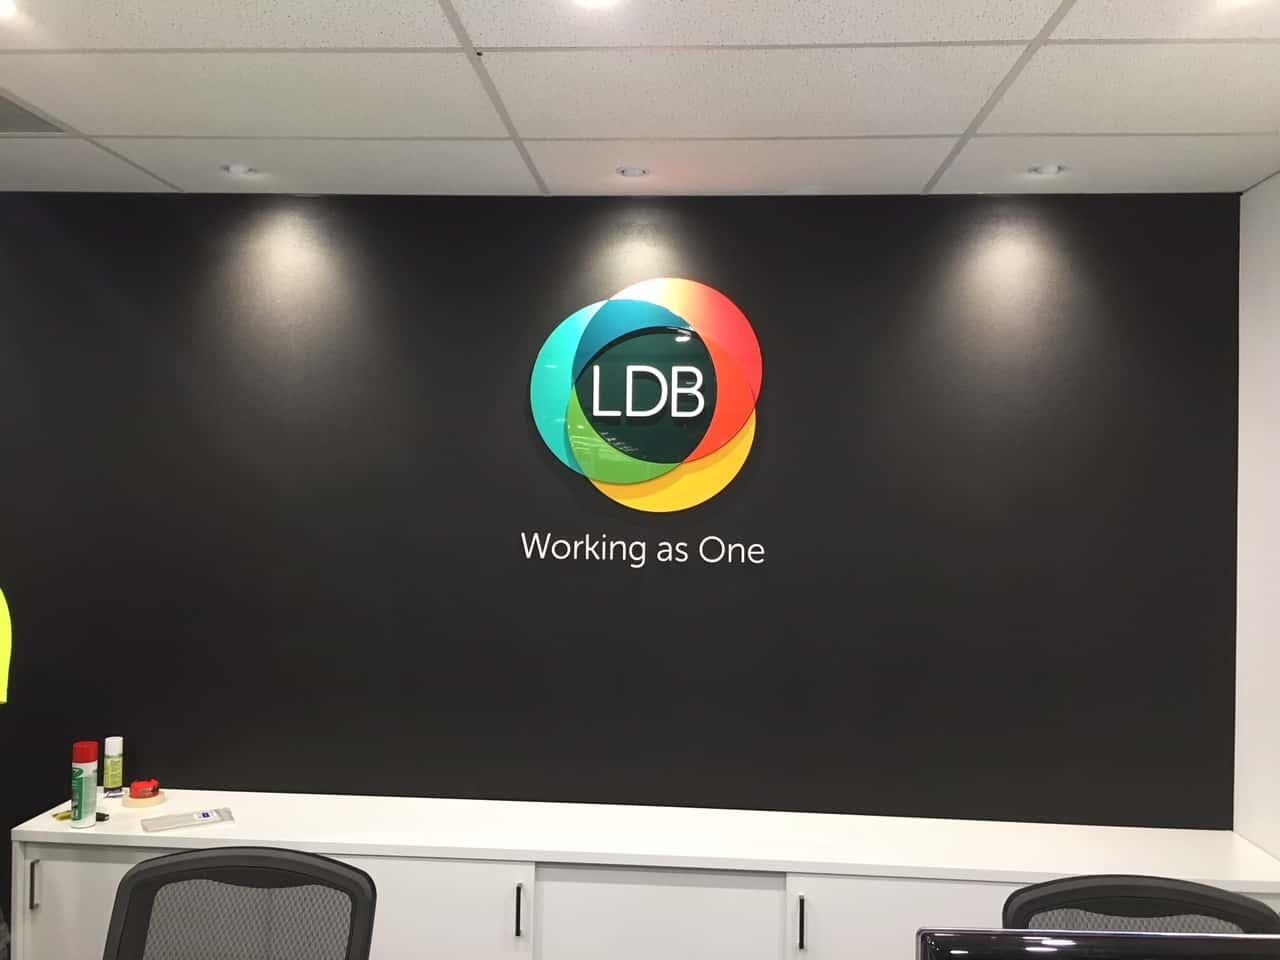 reception Signage LDB